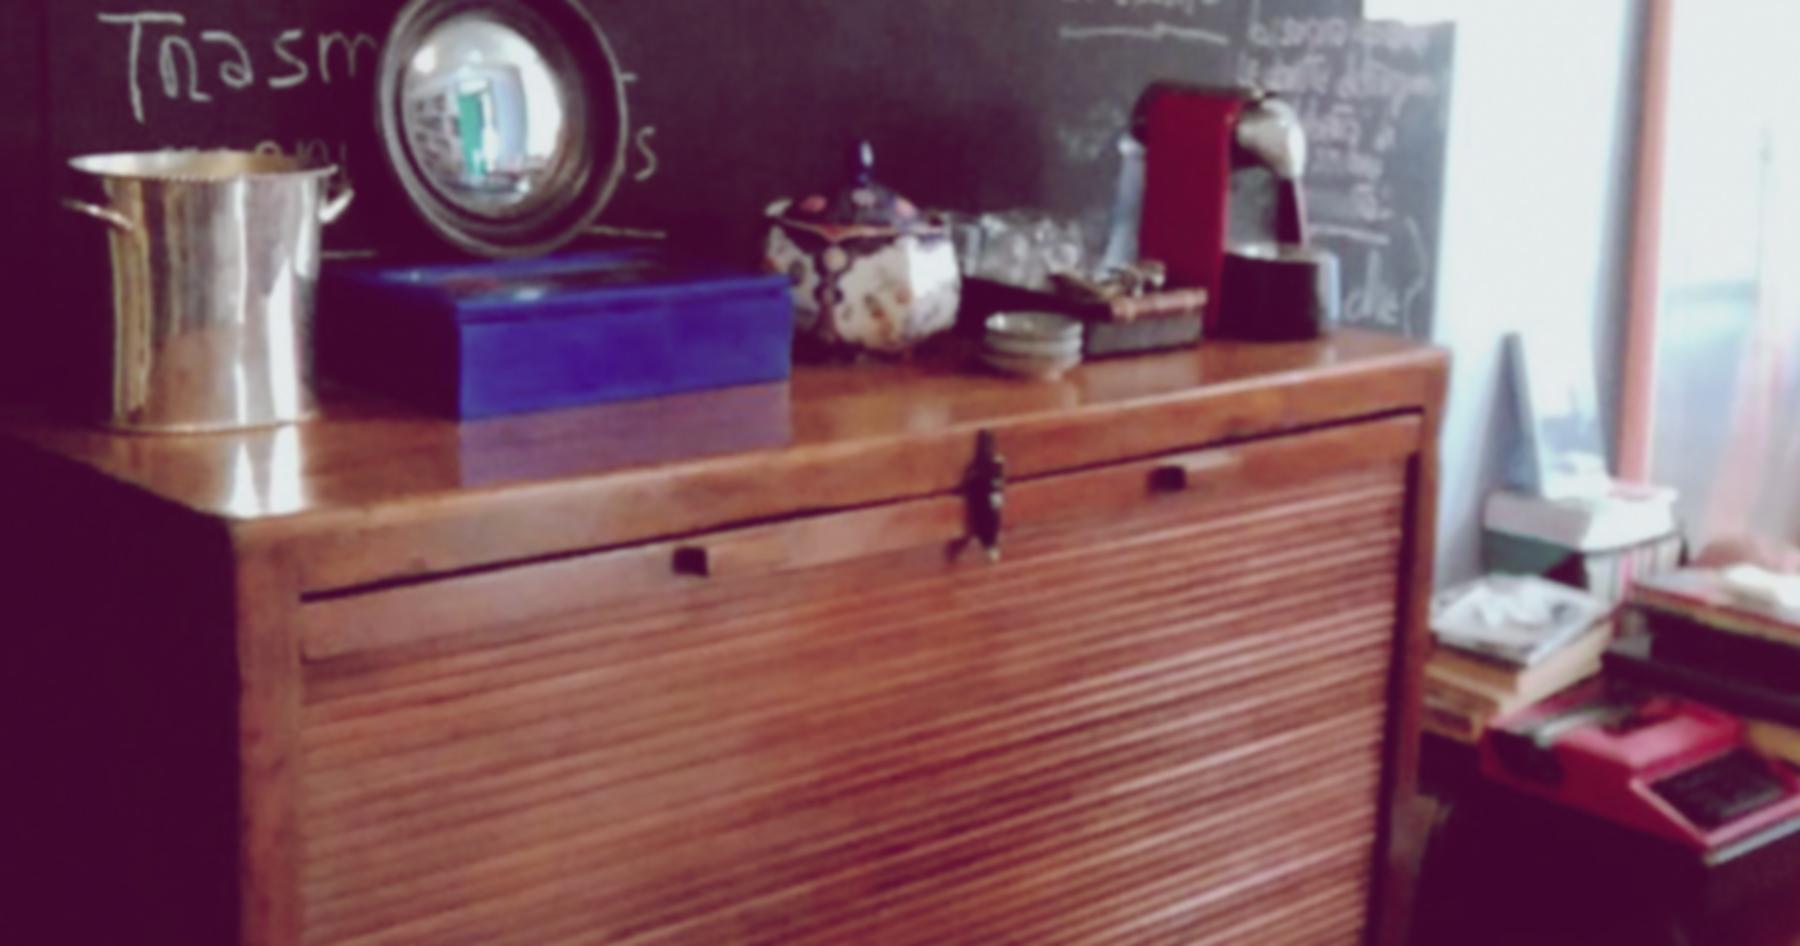 madia-vintage-arredamento-allestimento